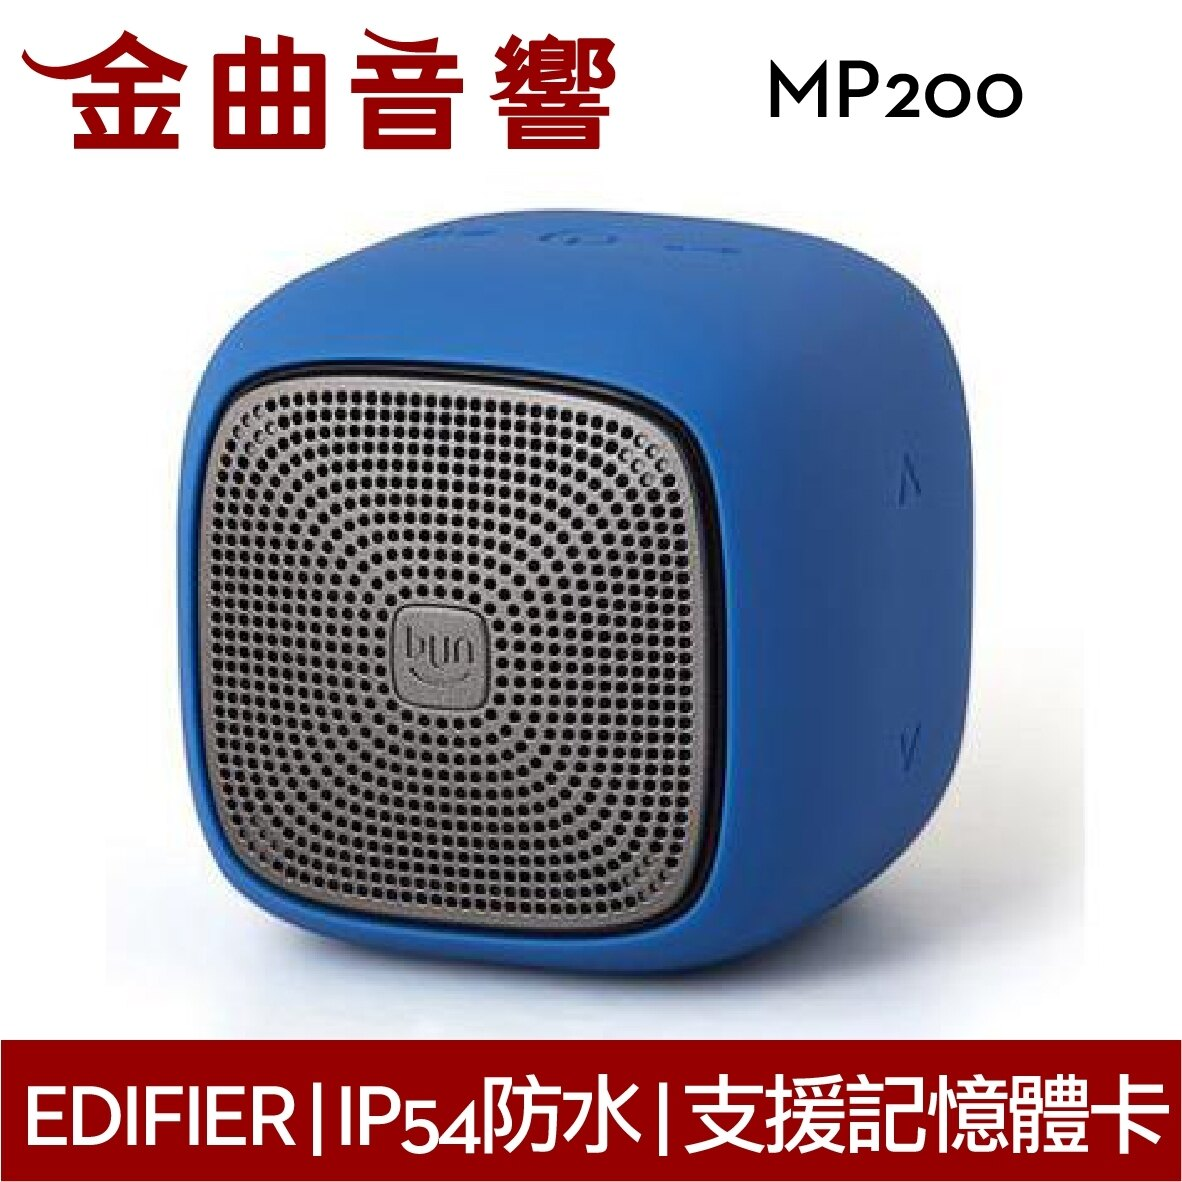 EDIFIER 漫步者 MP200 多色可選 藍牙喇叭   金曲音響